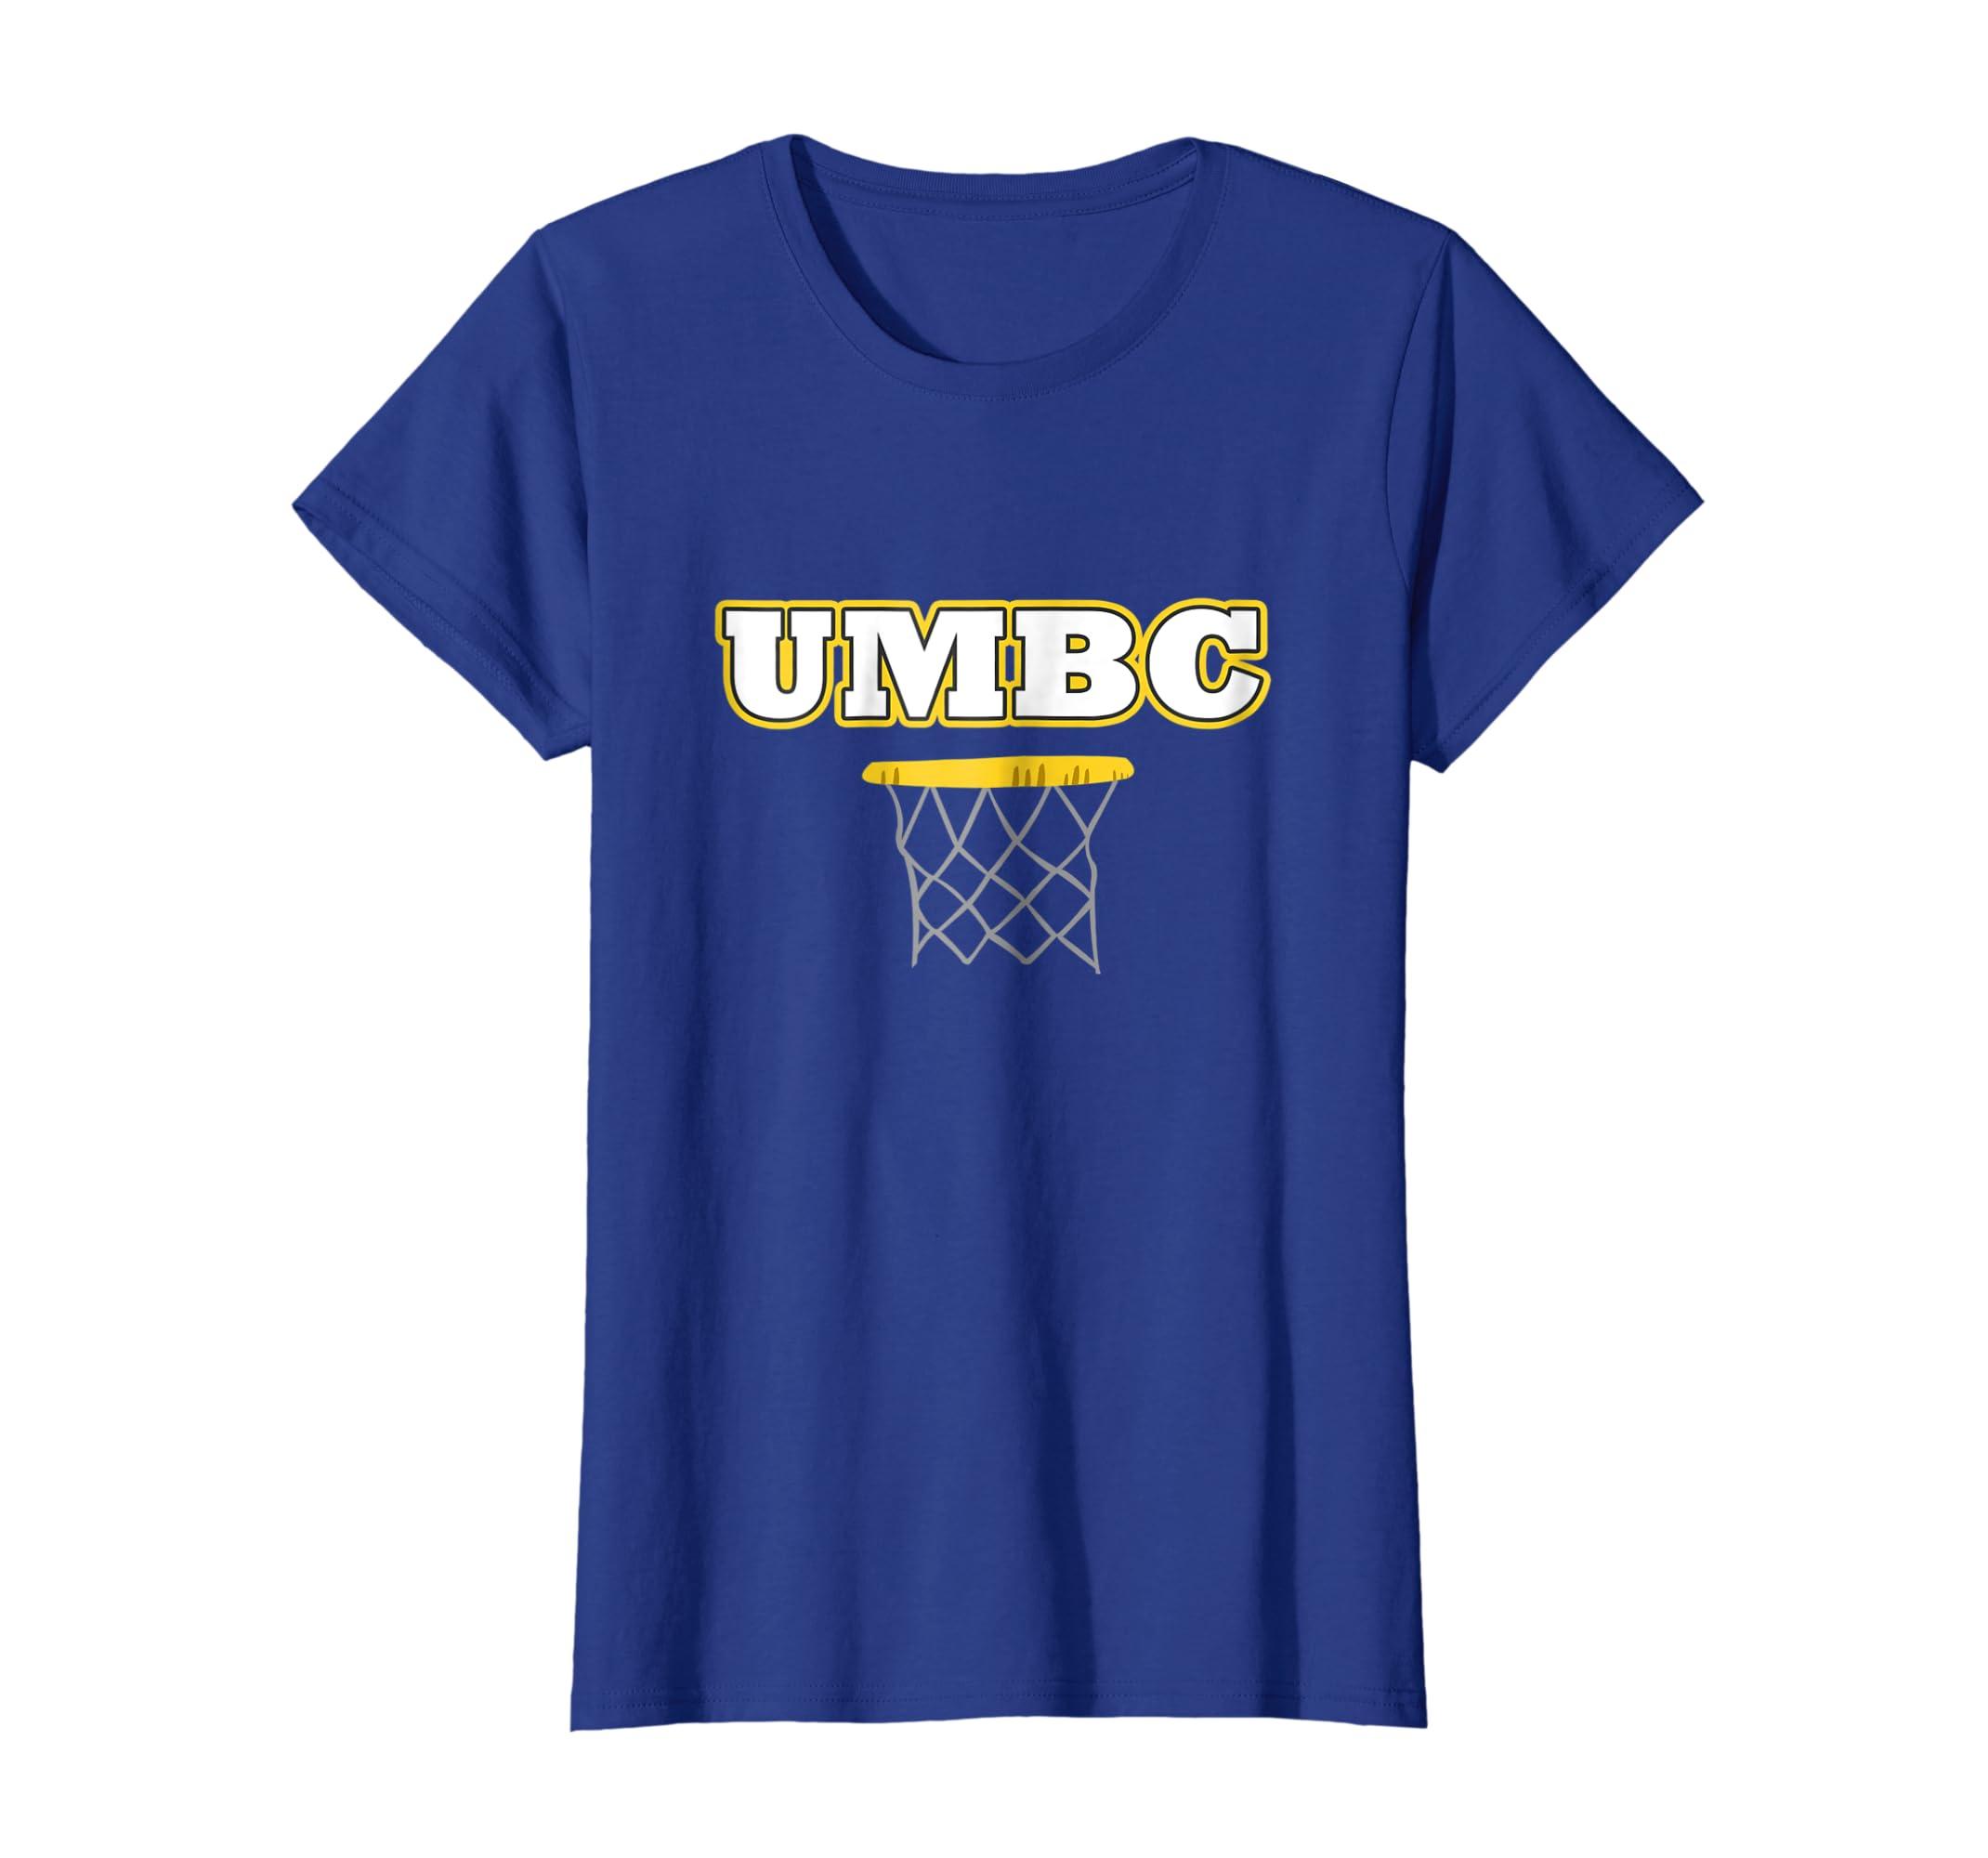 5fb026b3 Amazon.com: UMBC tee - Basketball tee shirt: Clothing